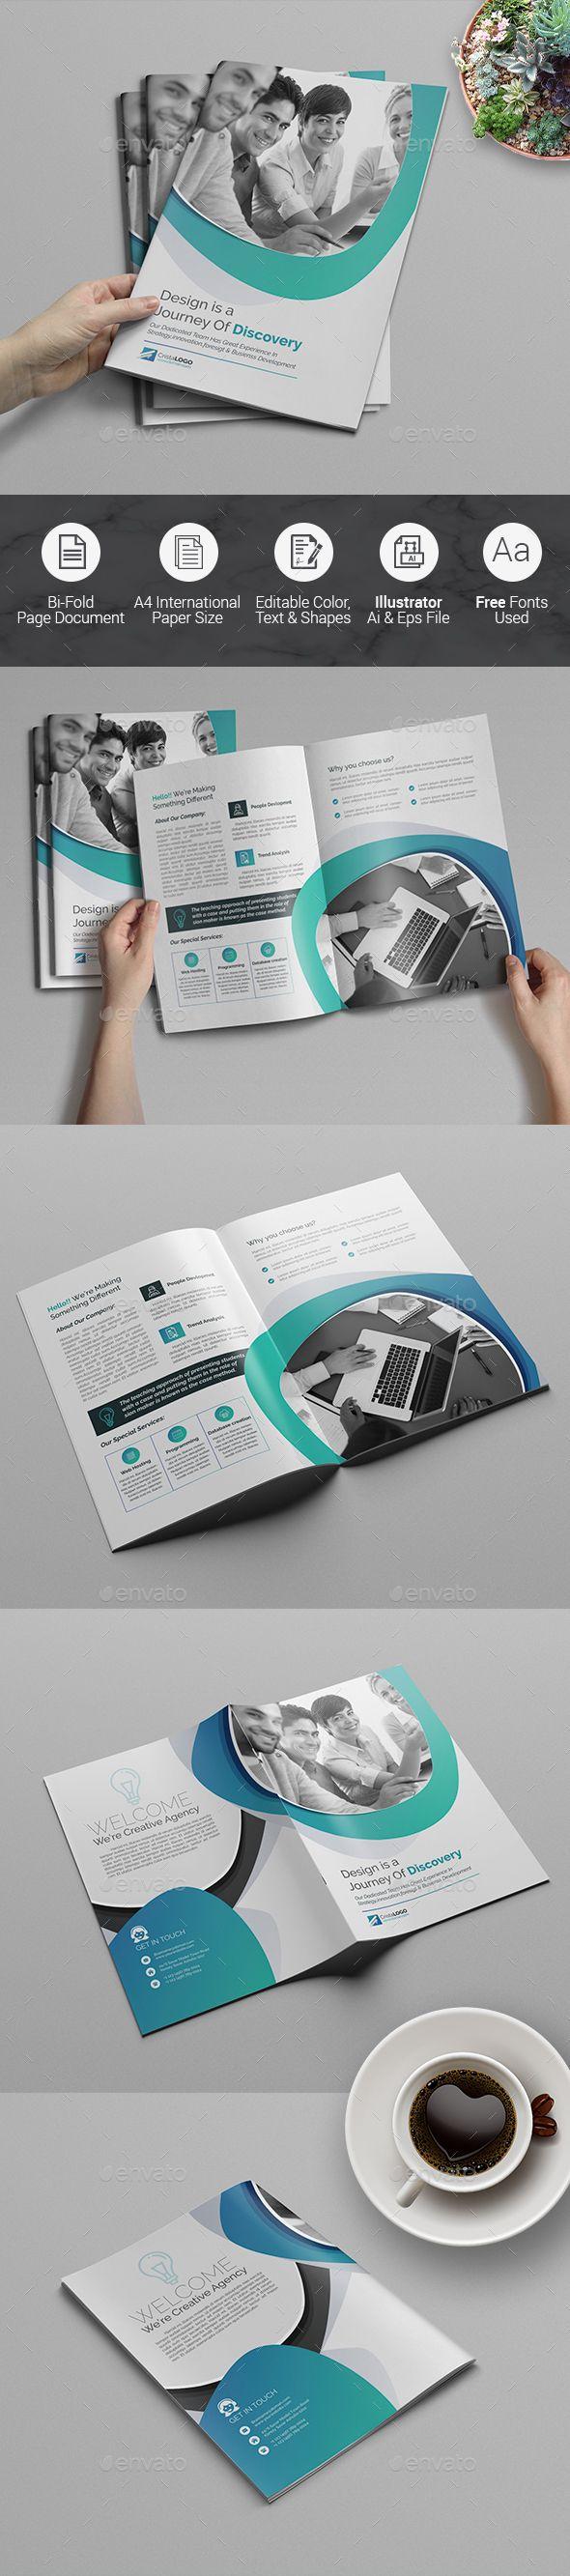 10130 best images about brochure templates on pinterest for Bi fold brochure template illustrator